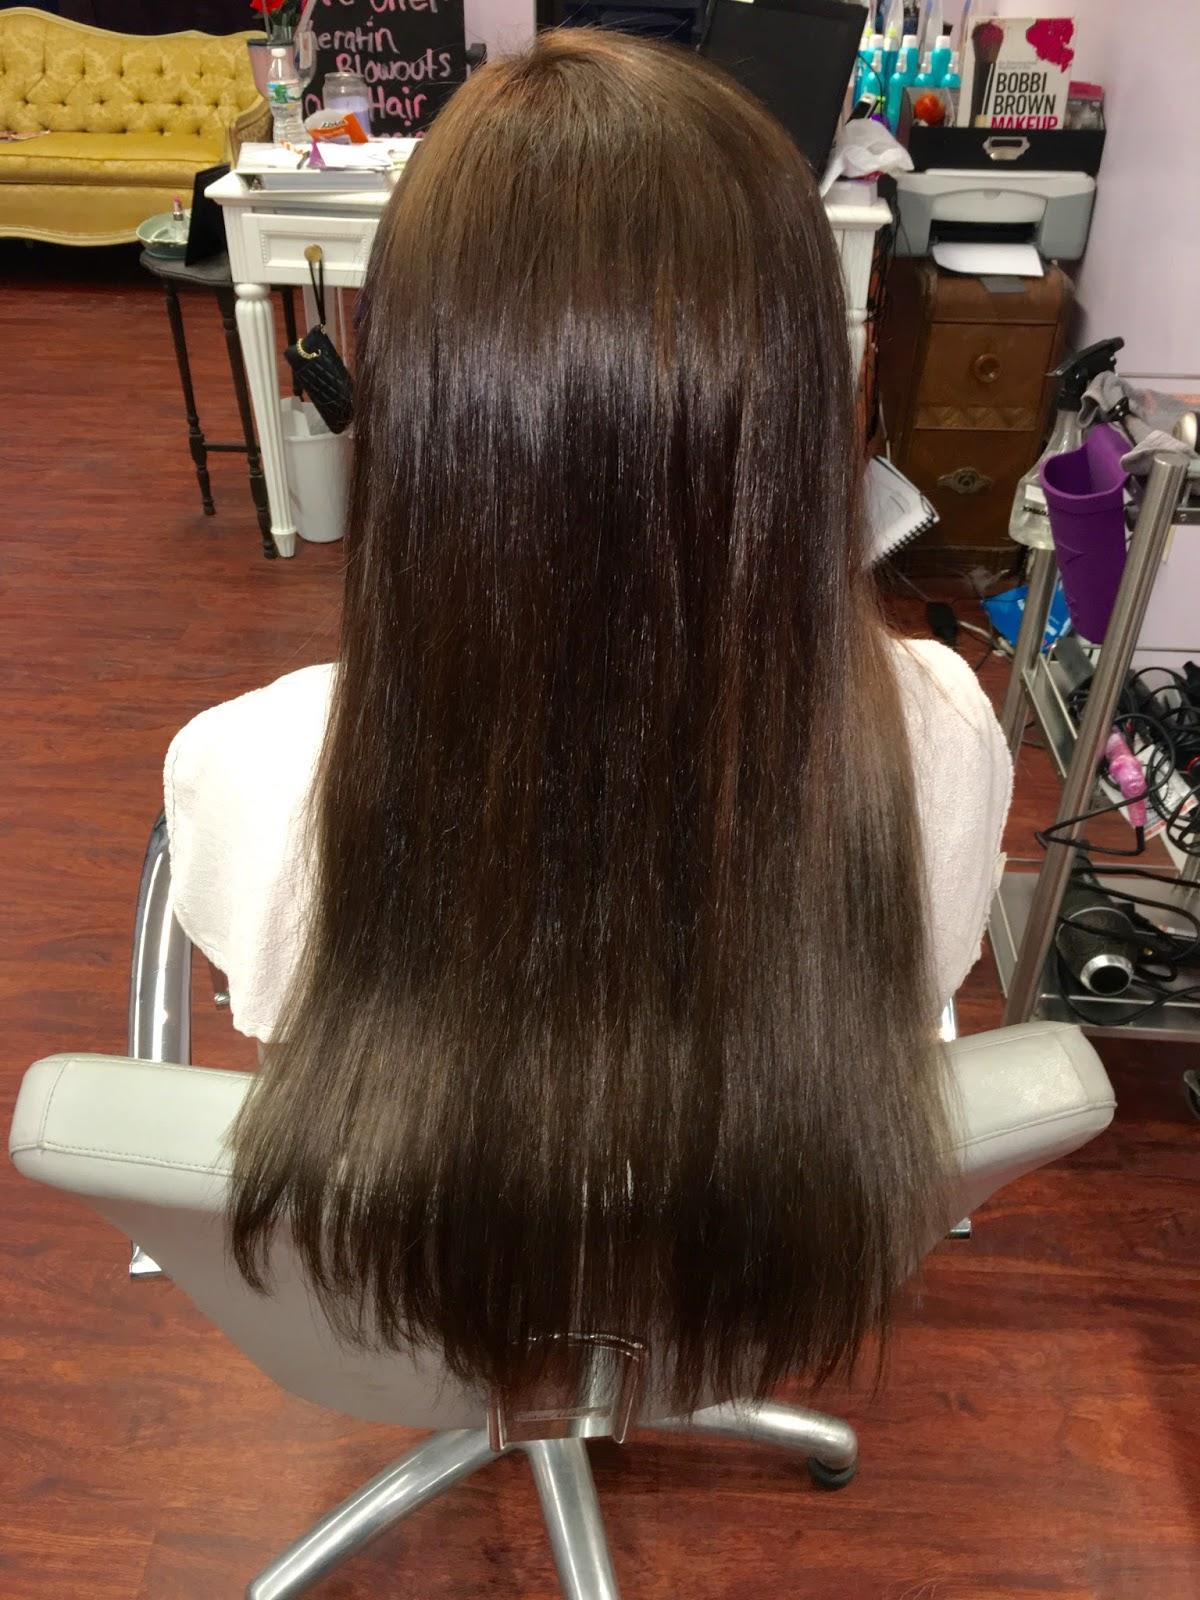 Hair Extensions By Jaclynn Kate Good Hair Extensions Vs Bad Hair